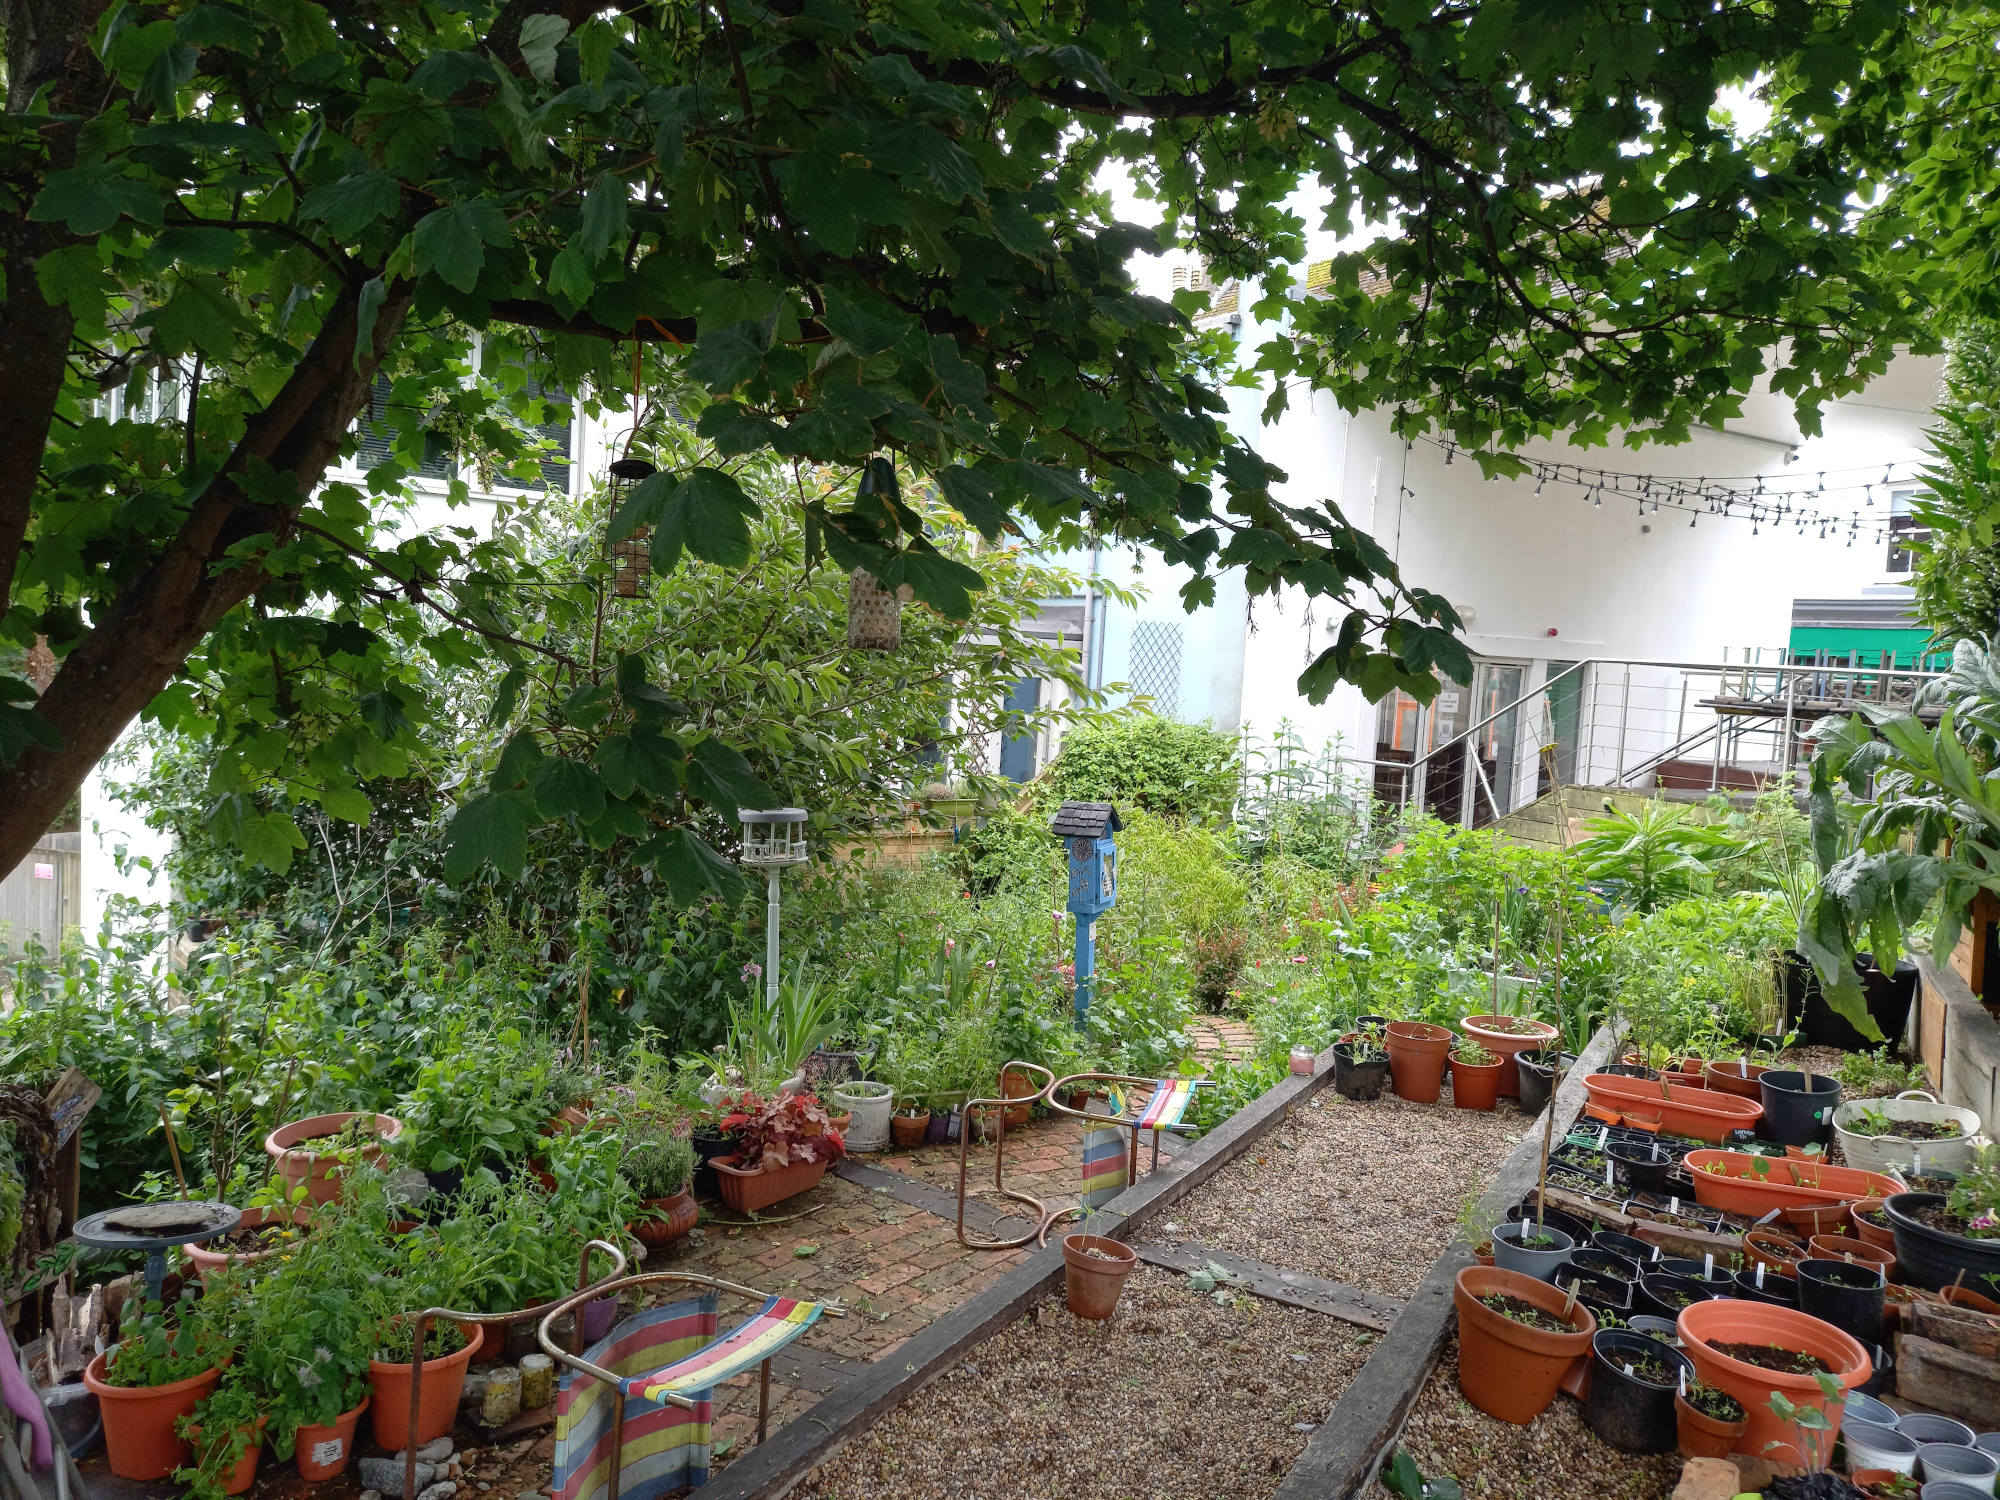 Payers Pocket Community Garden